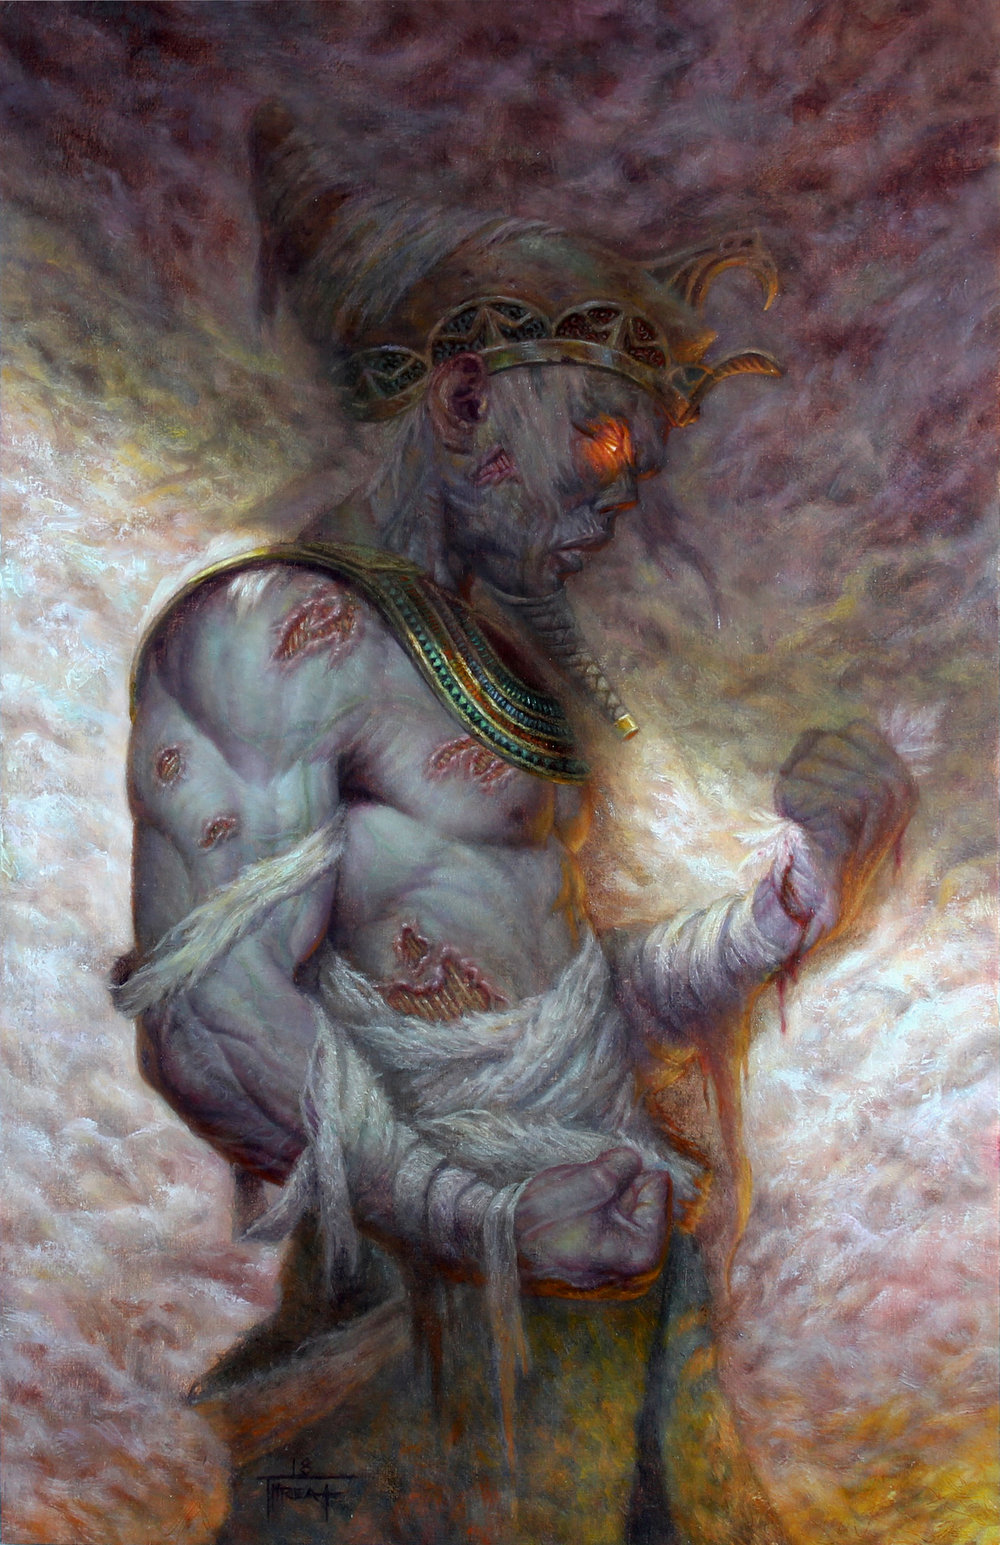 Undead Pharaoh  11 x 17in